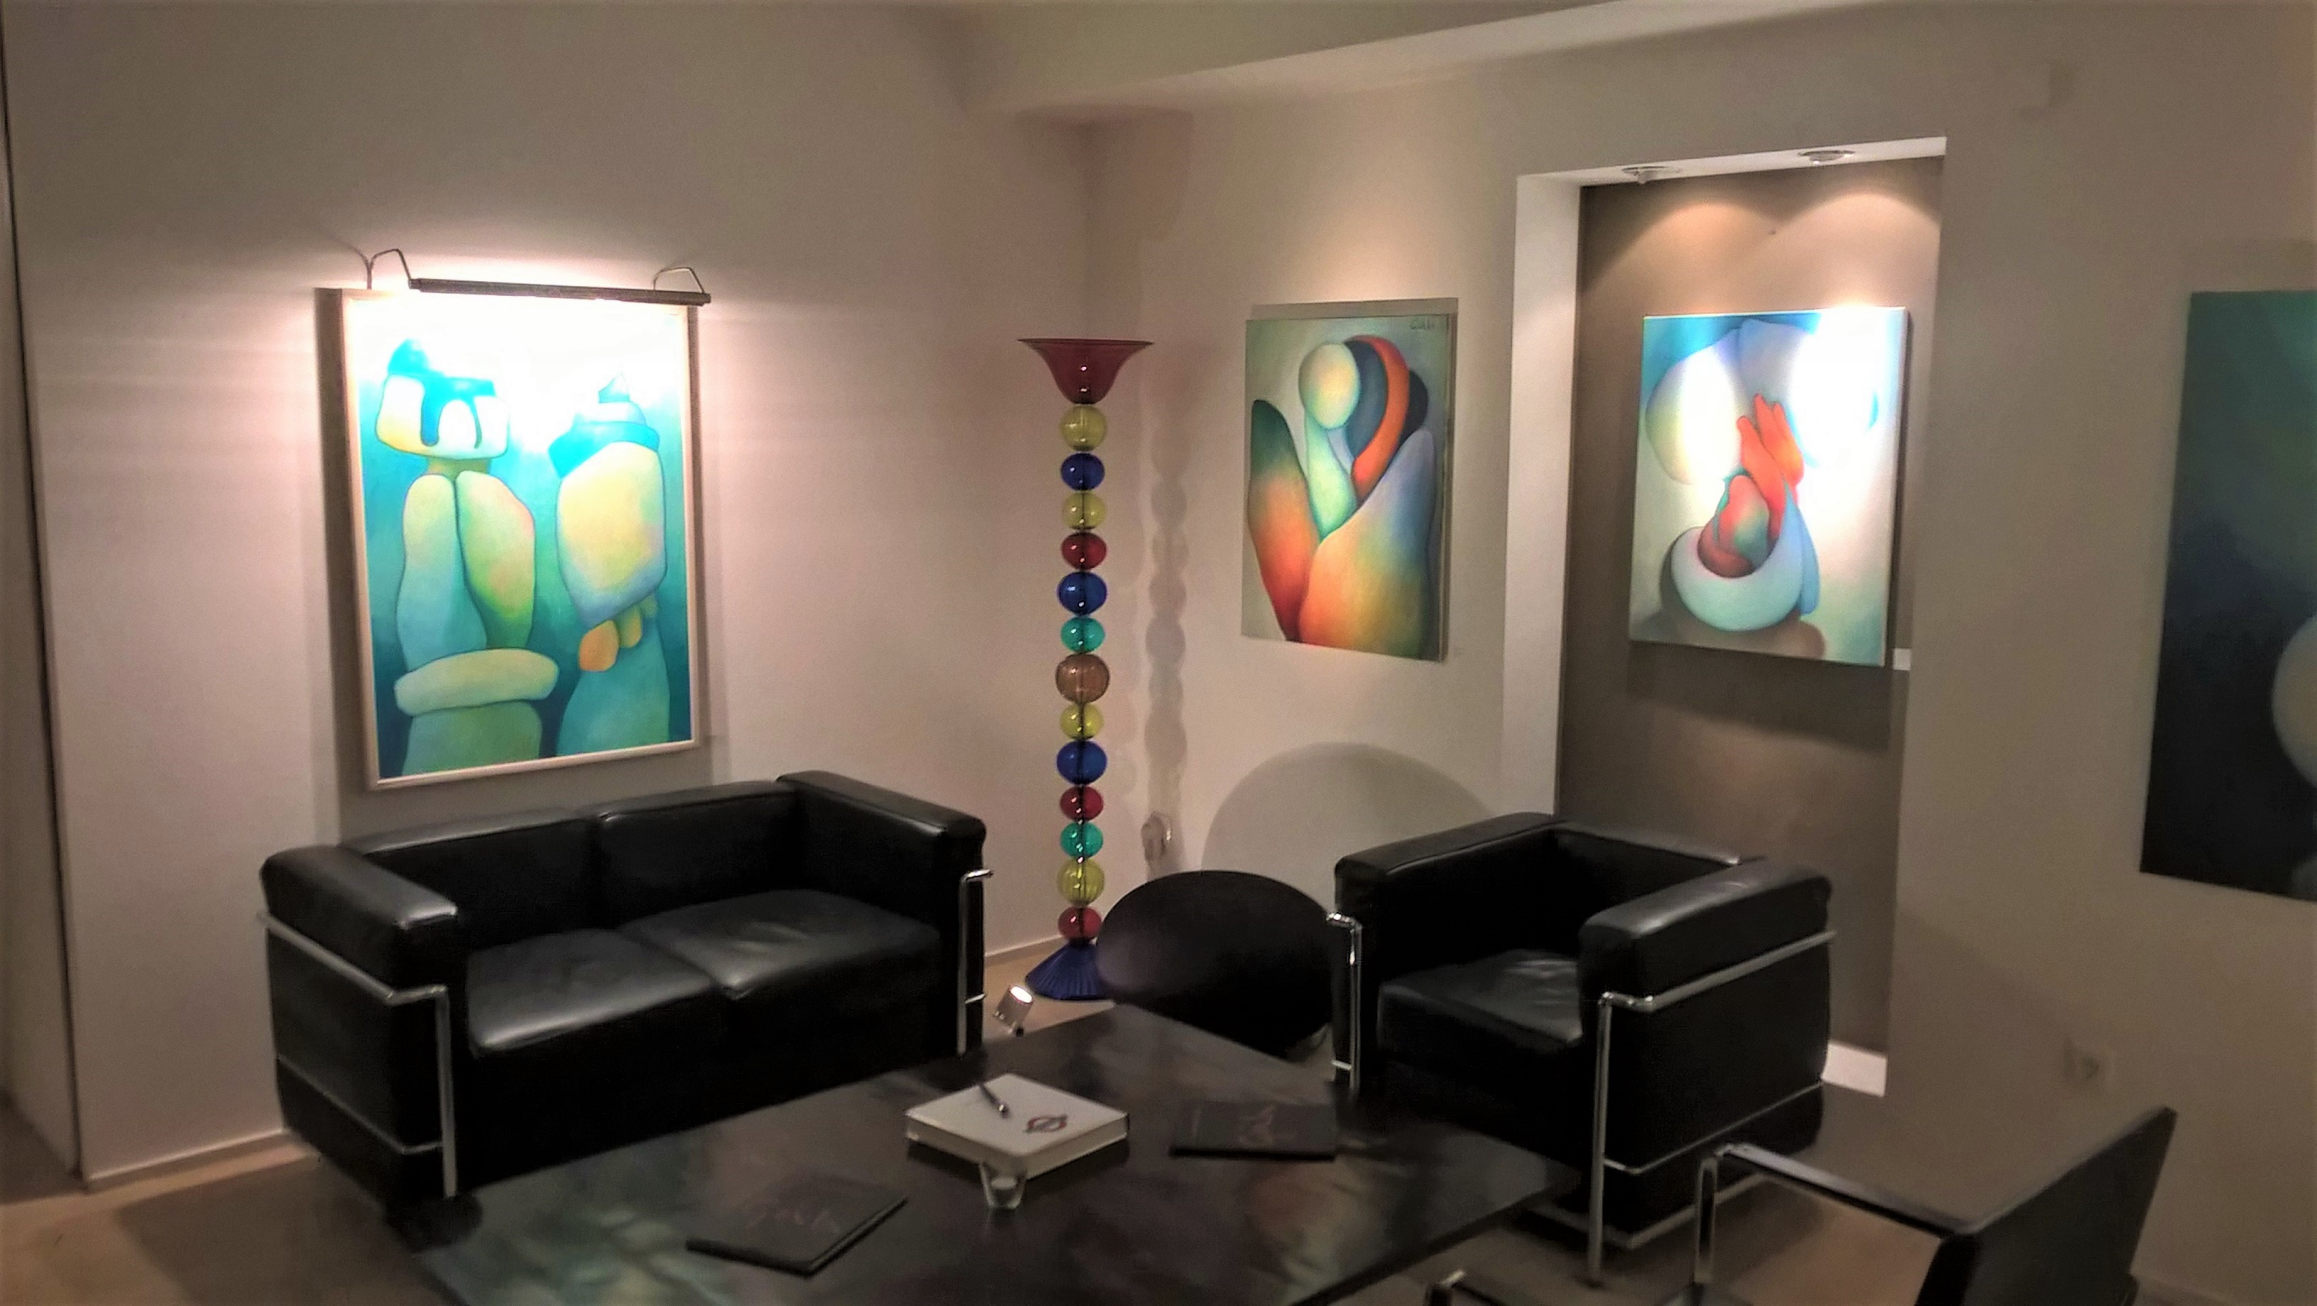 Reinhard Gäde Galerie Baumgartl Ausstellung 2017 4.jpg